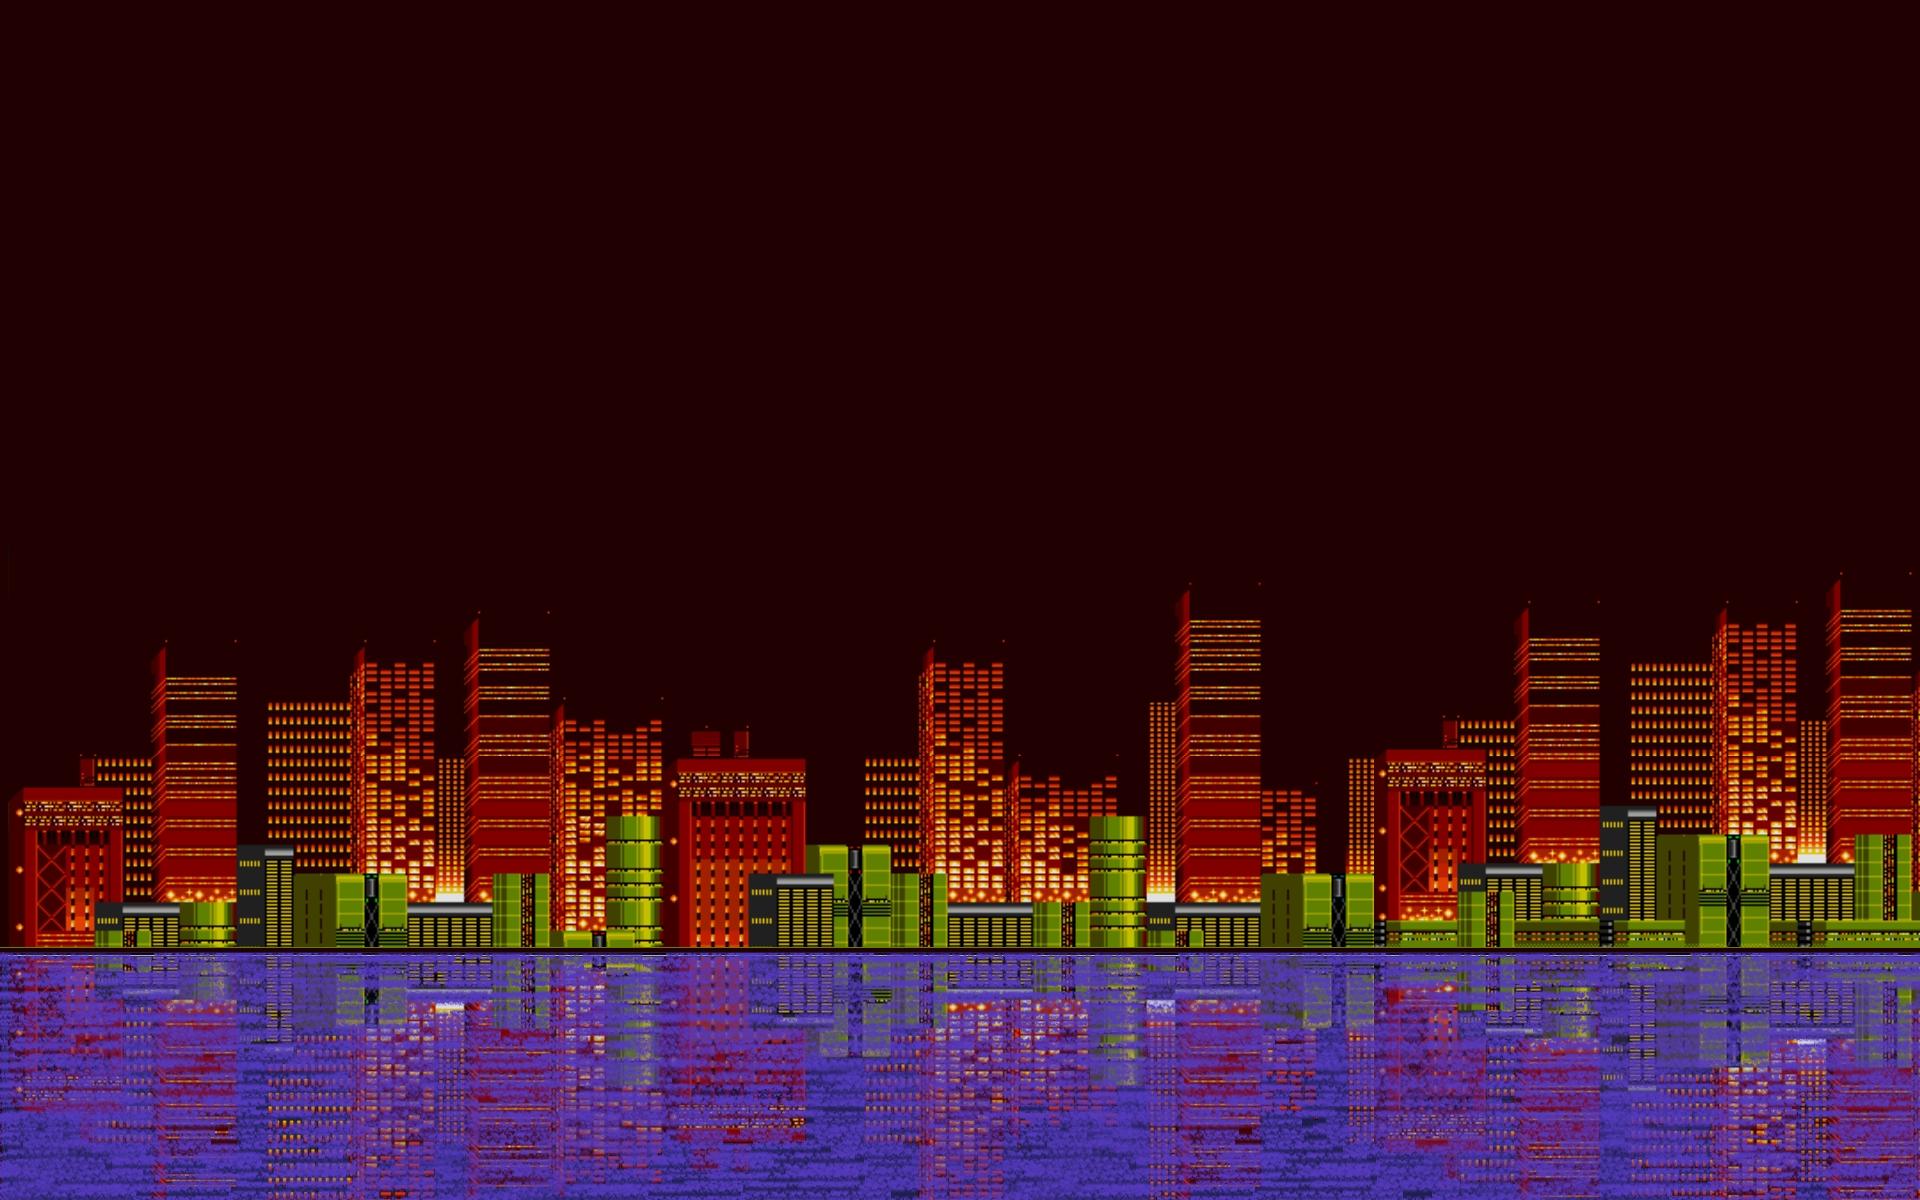 8 bit wallpaper hd. - media file | pixelstalk